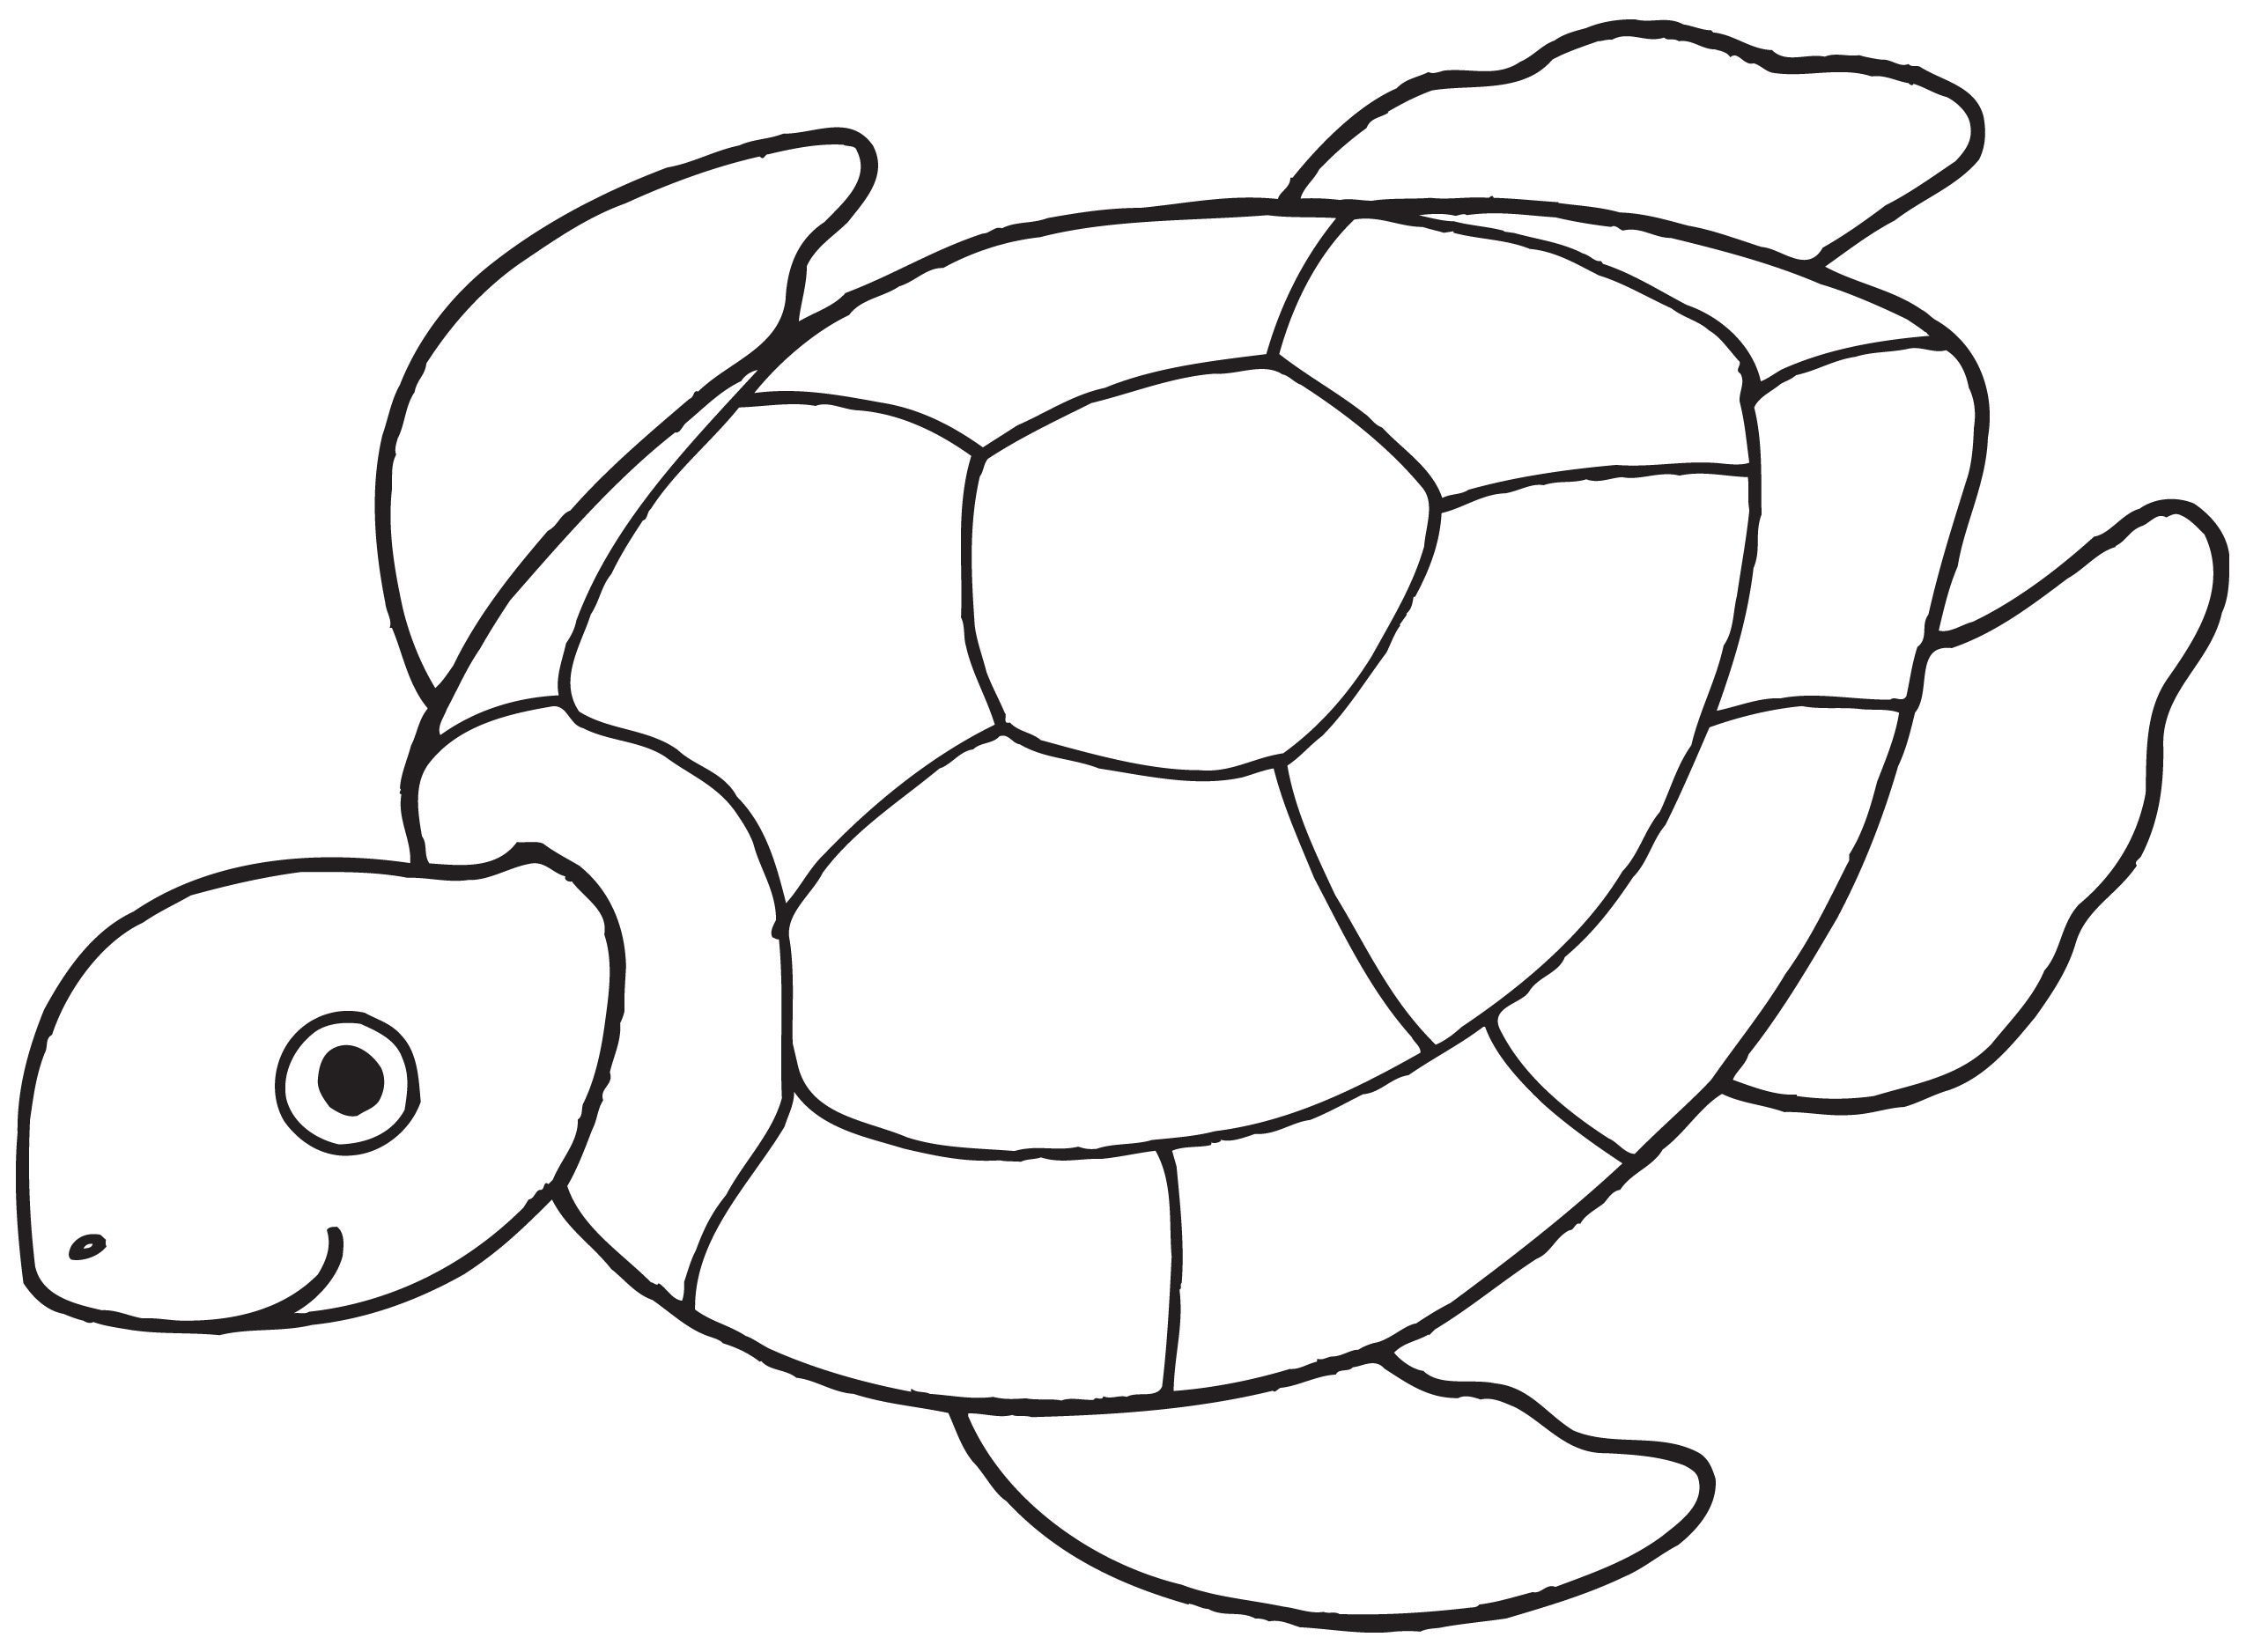 2550x1876 Simple Sea Turtle Drawing Turtle Clip Art Sea Turtle Clip Art